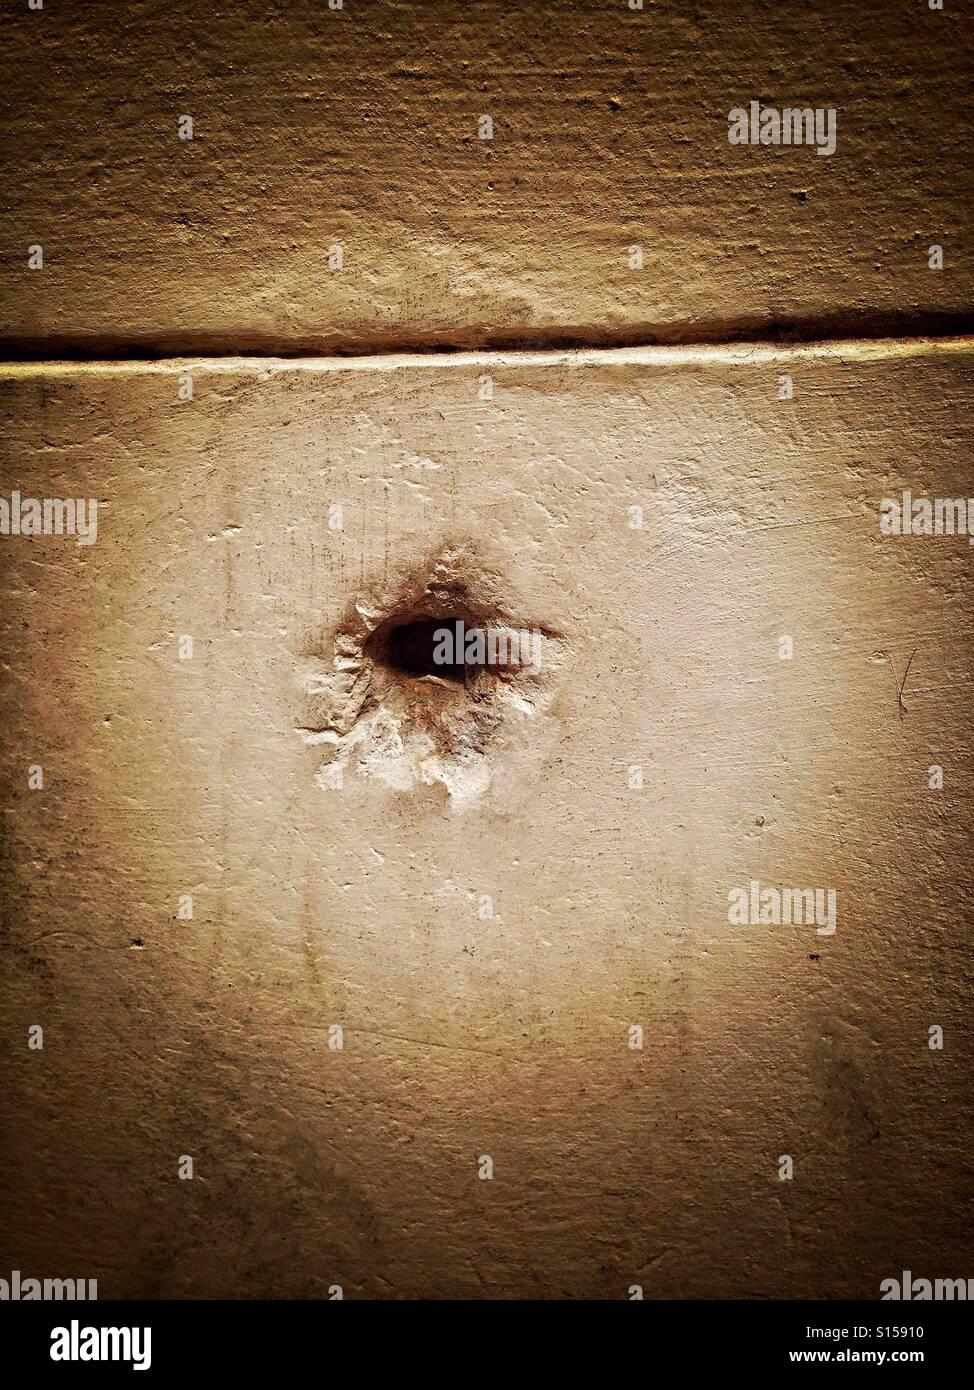 Bullet hole - Stock Image